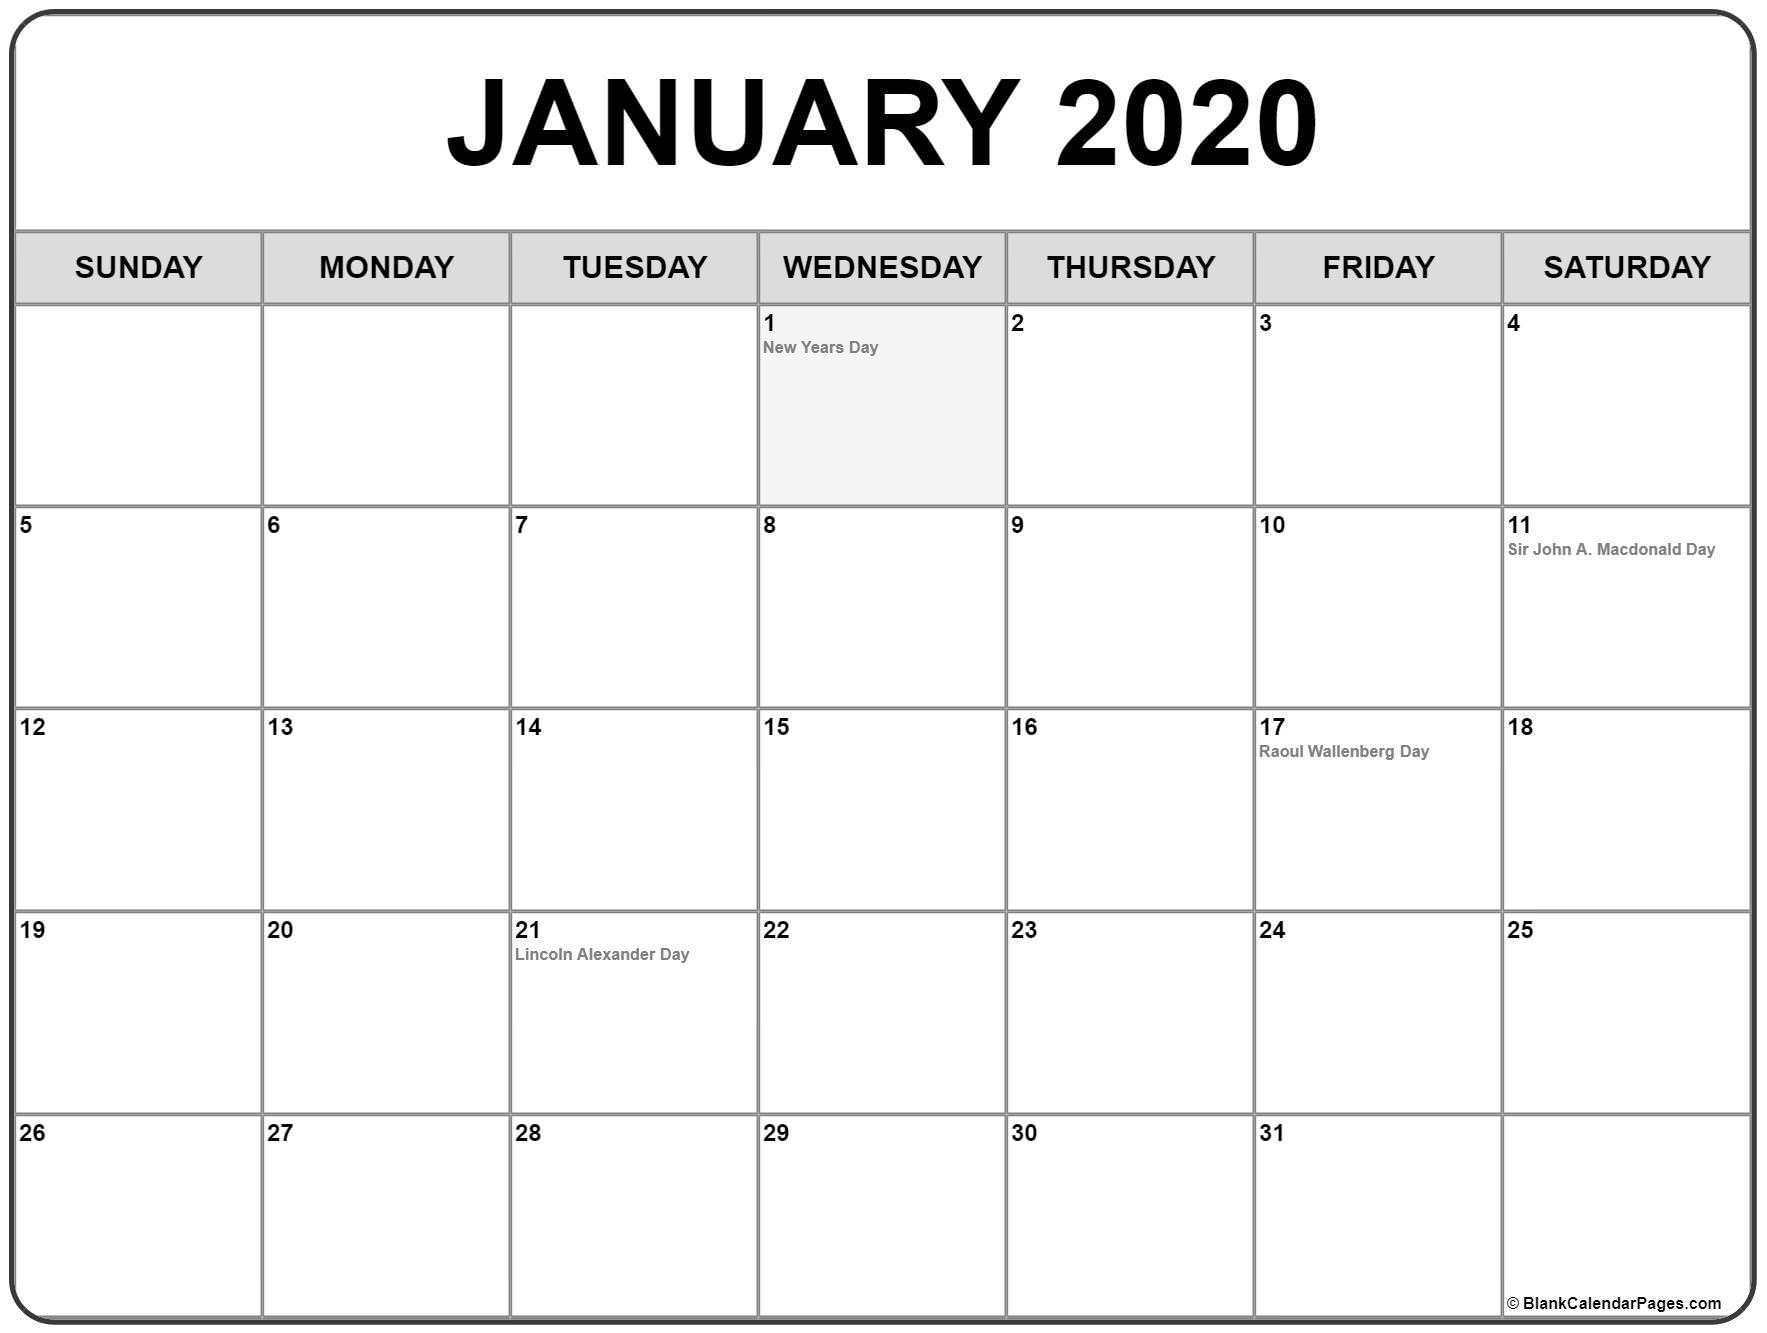 Perky 2020 Calendar Public Holidays • Printable Blank-January 2020 Calendar Public Holidays